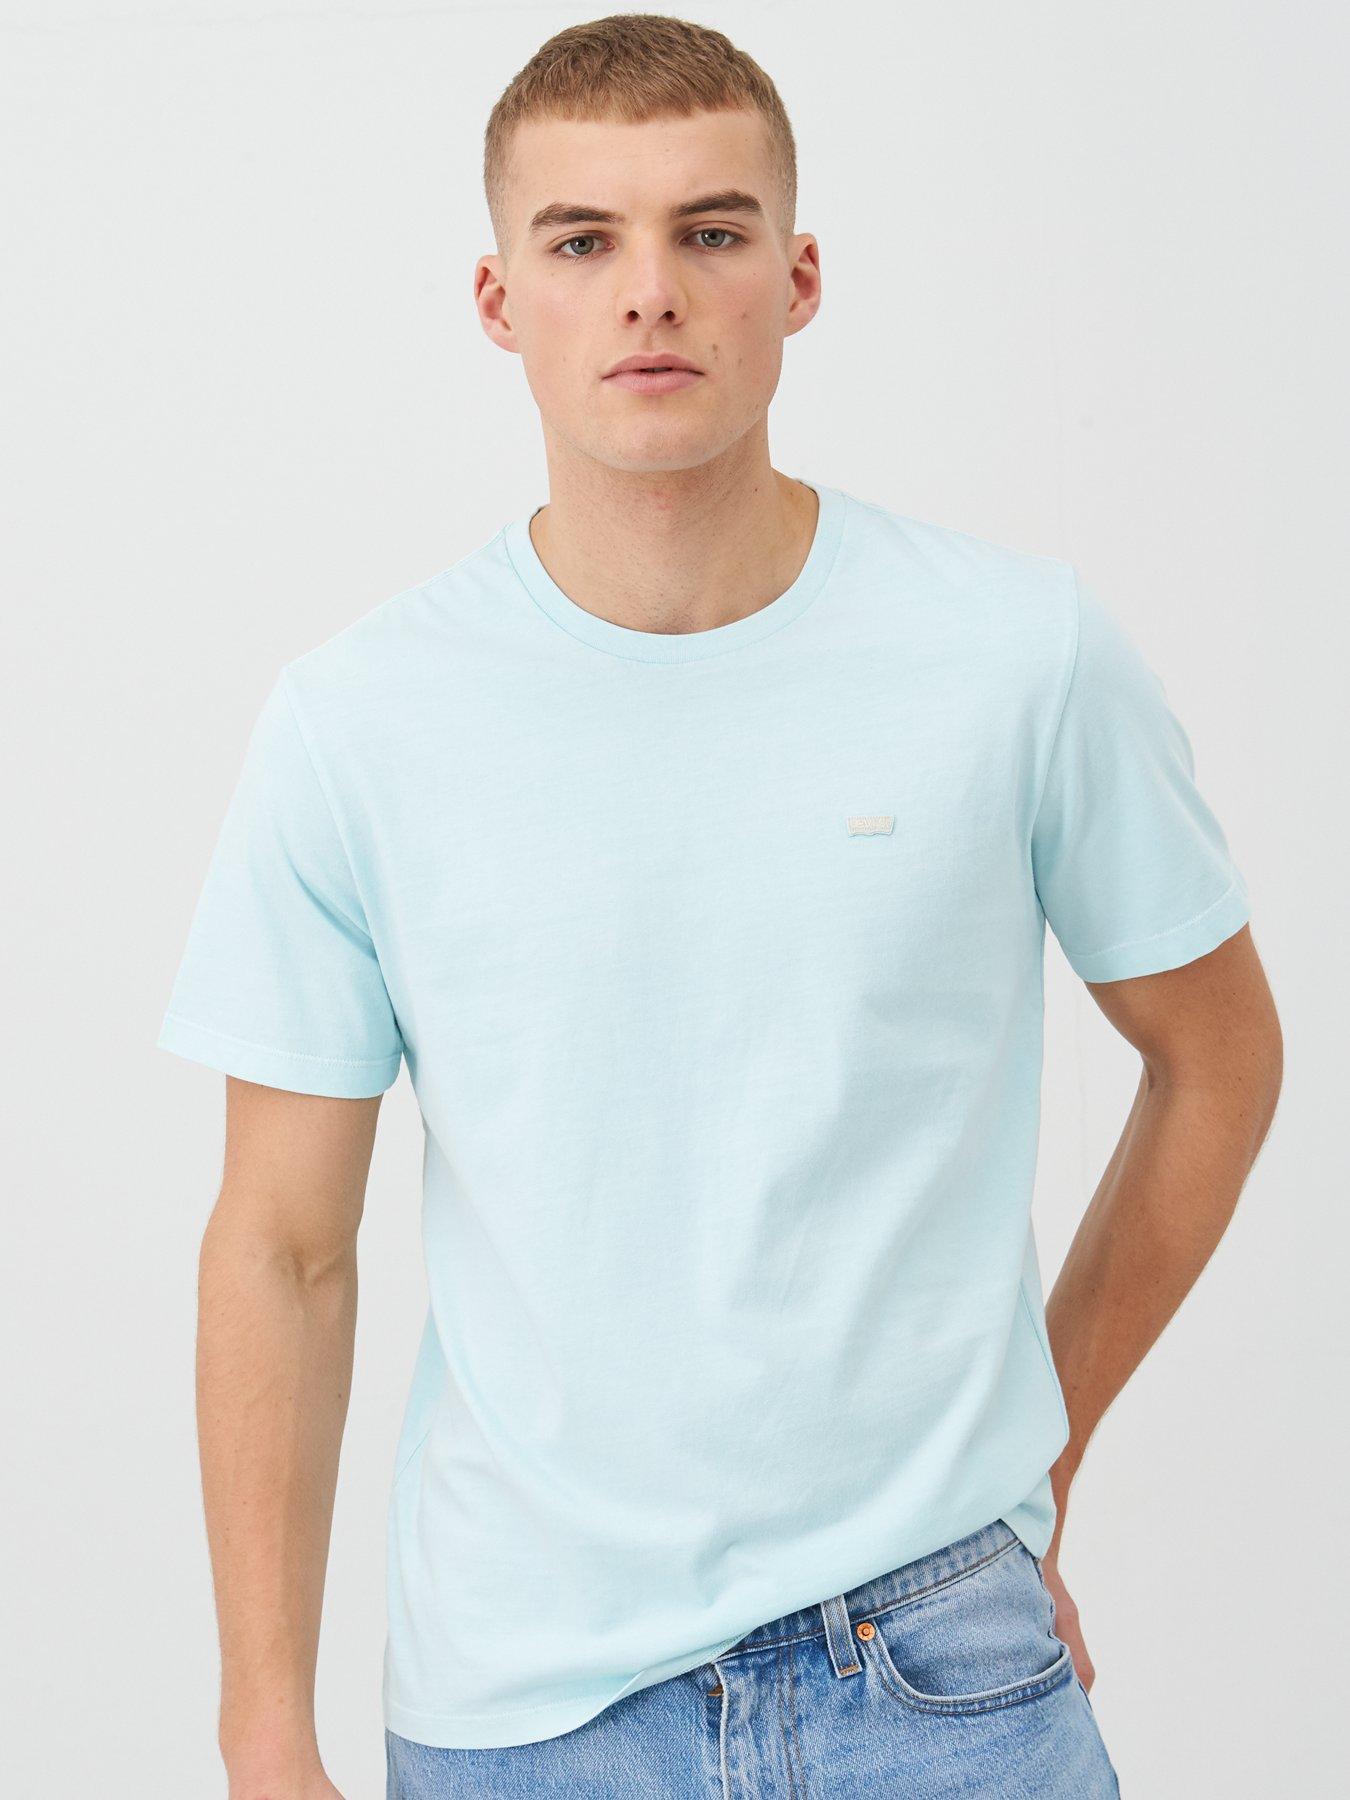 BIG SM EXTREME SPORTSWEAR Shirt T-Shirt Stretch Shirt Polo Shirt 2738